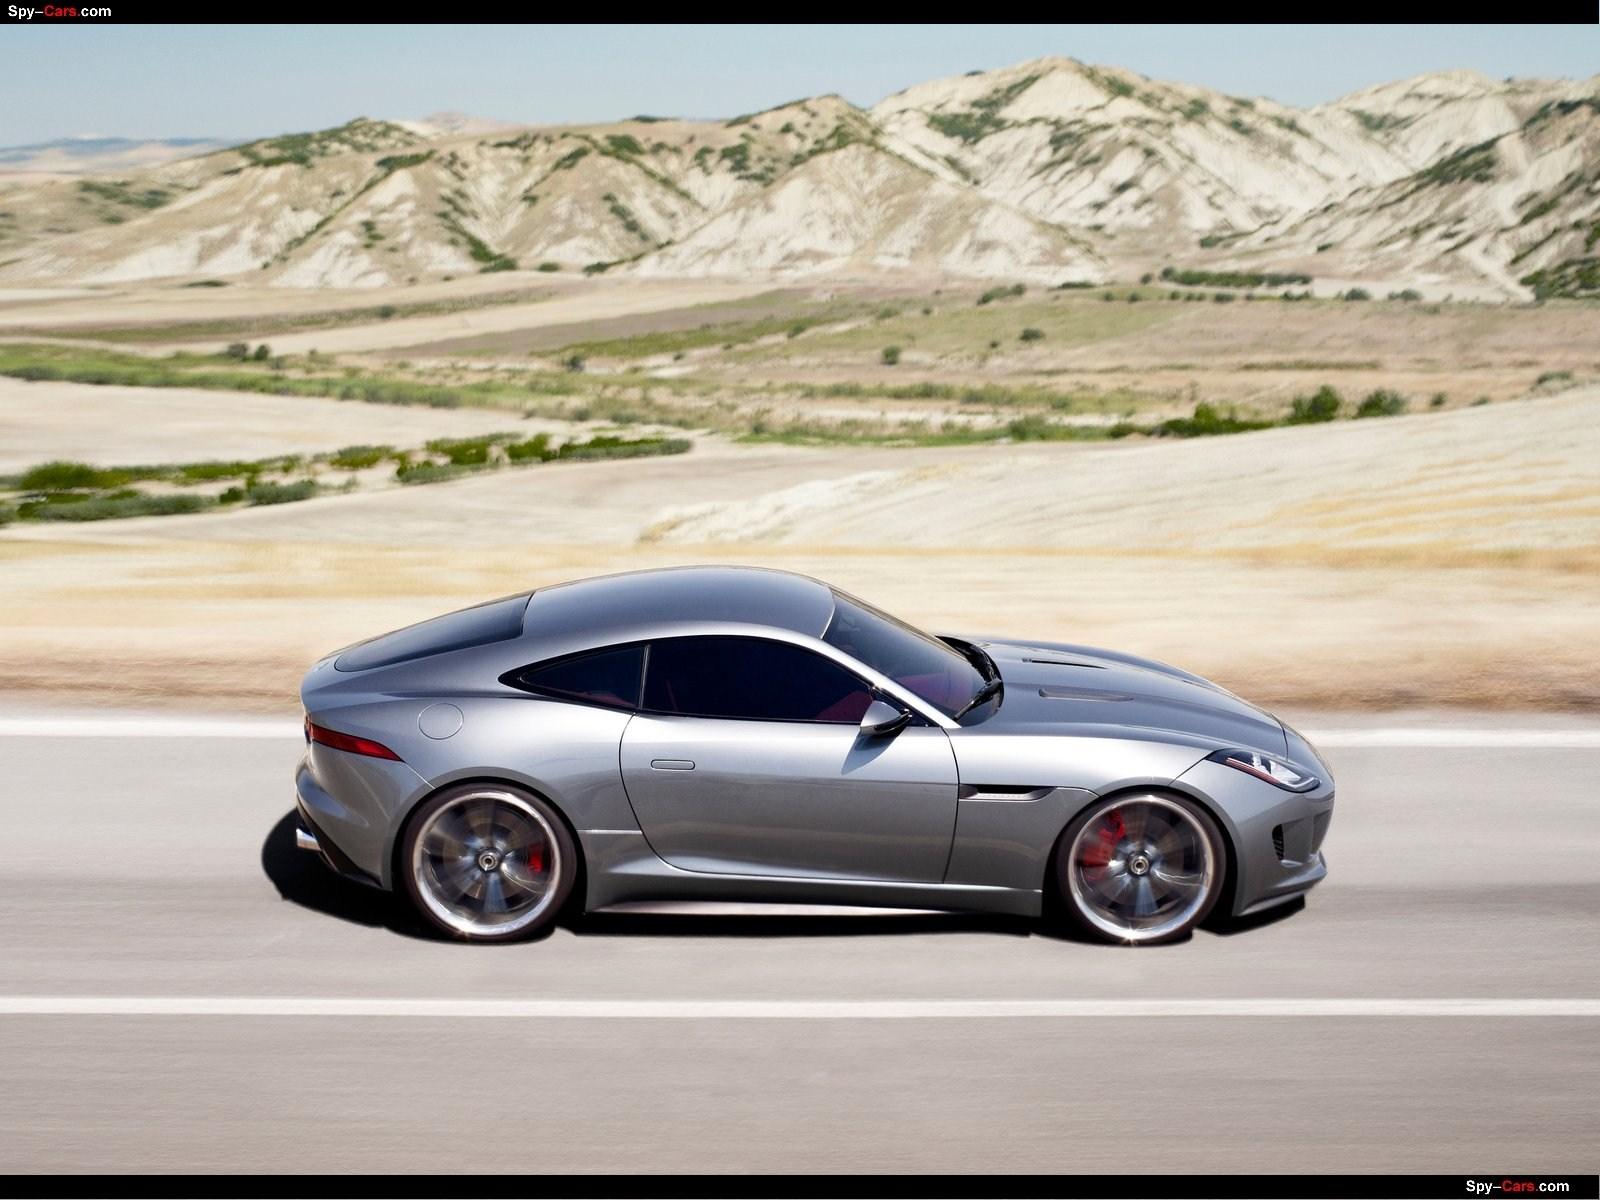 http://3.bp.blogspot.com/-pE_eks8tHH4/TmcC71EOWUI/AAAAAAAAZQQ/qnnb6KvcmeI/s1600/Jaguar-C-X16_Concept_2011_006.jpg